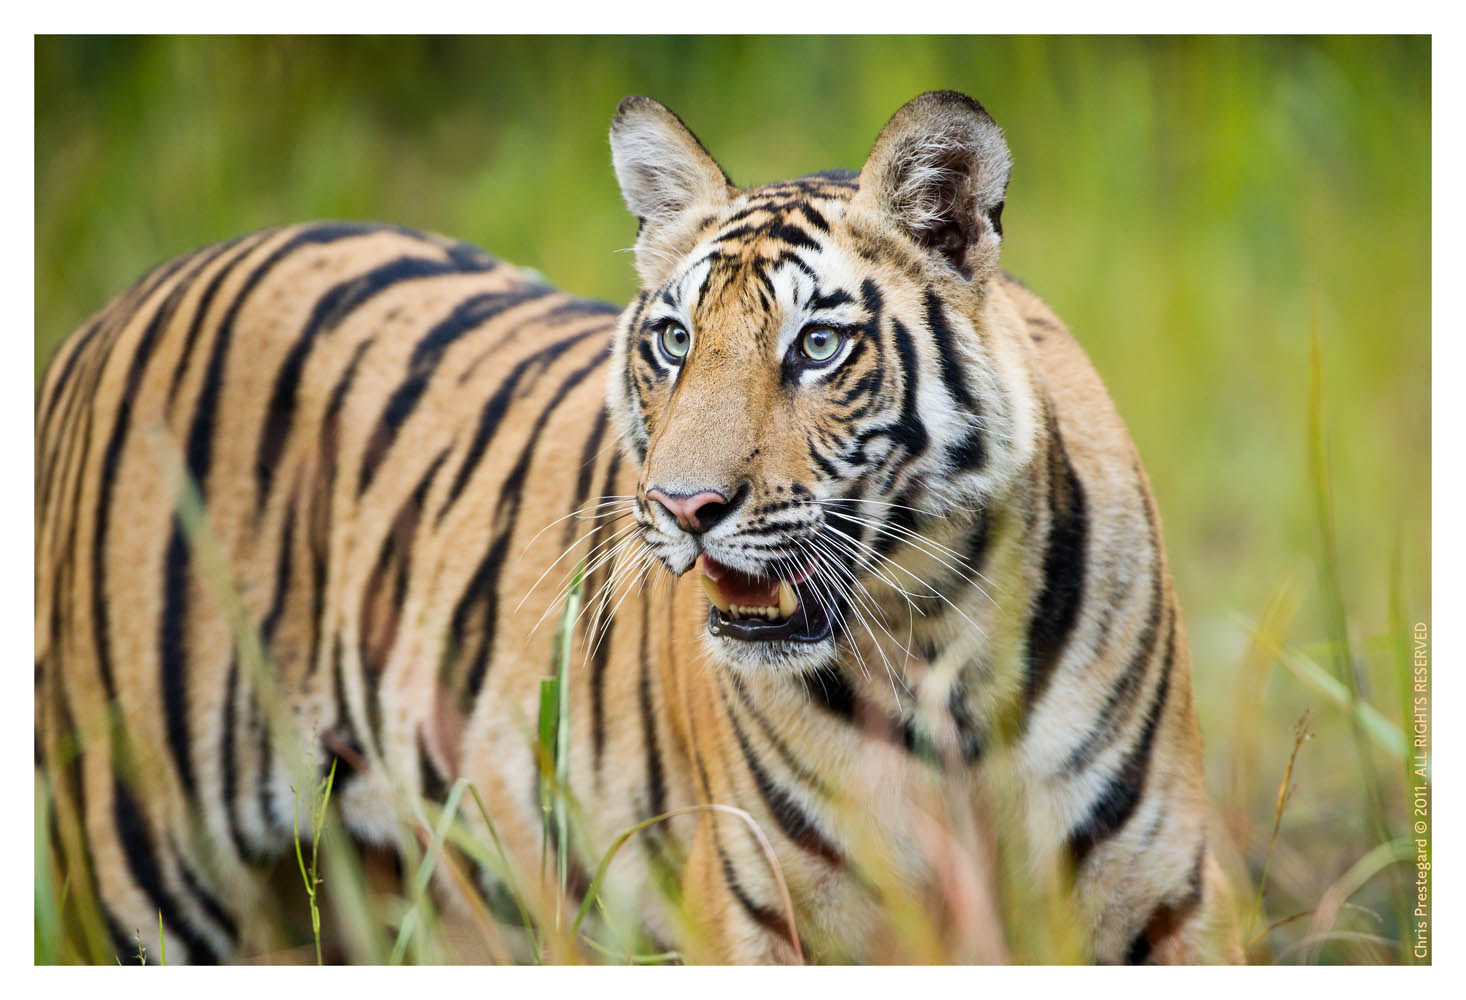 Tiger5552C-Apr23-2011